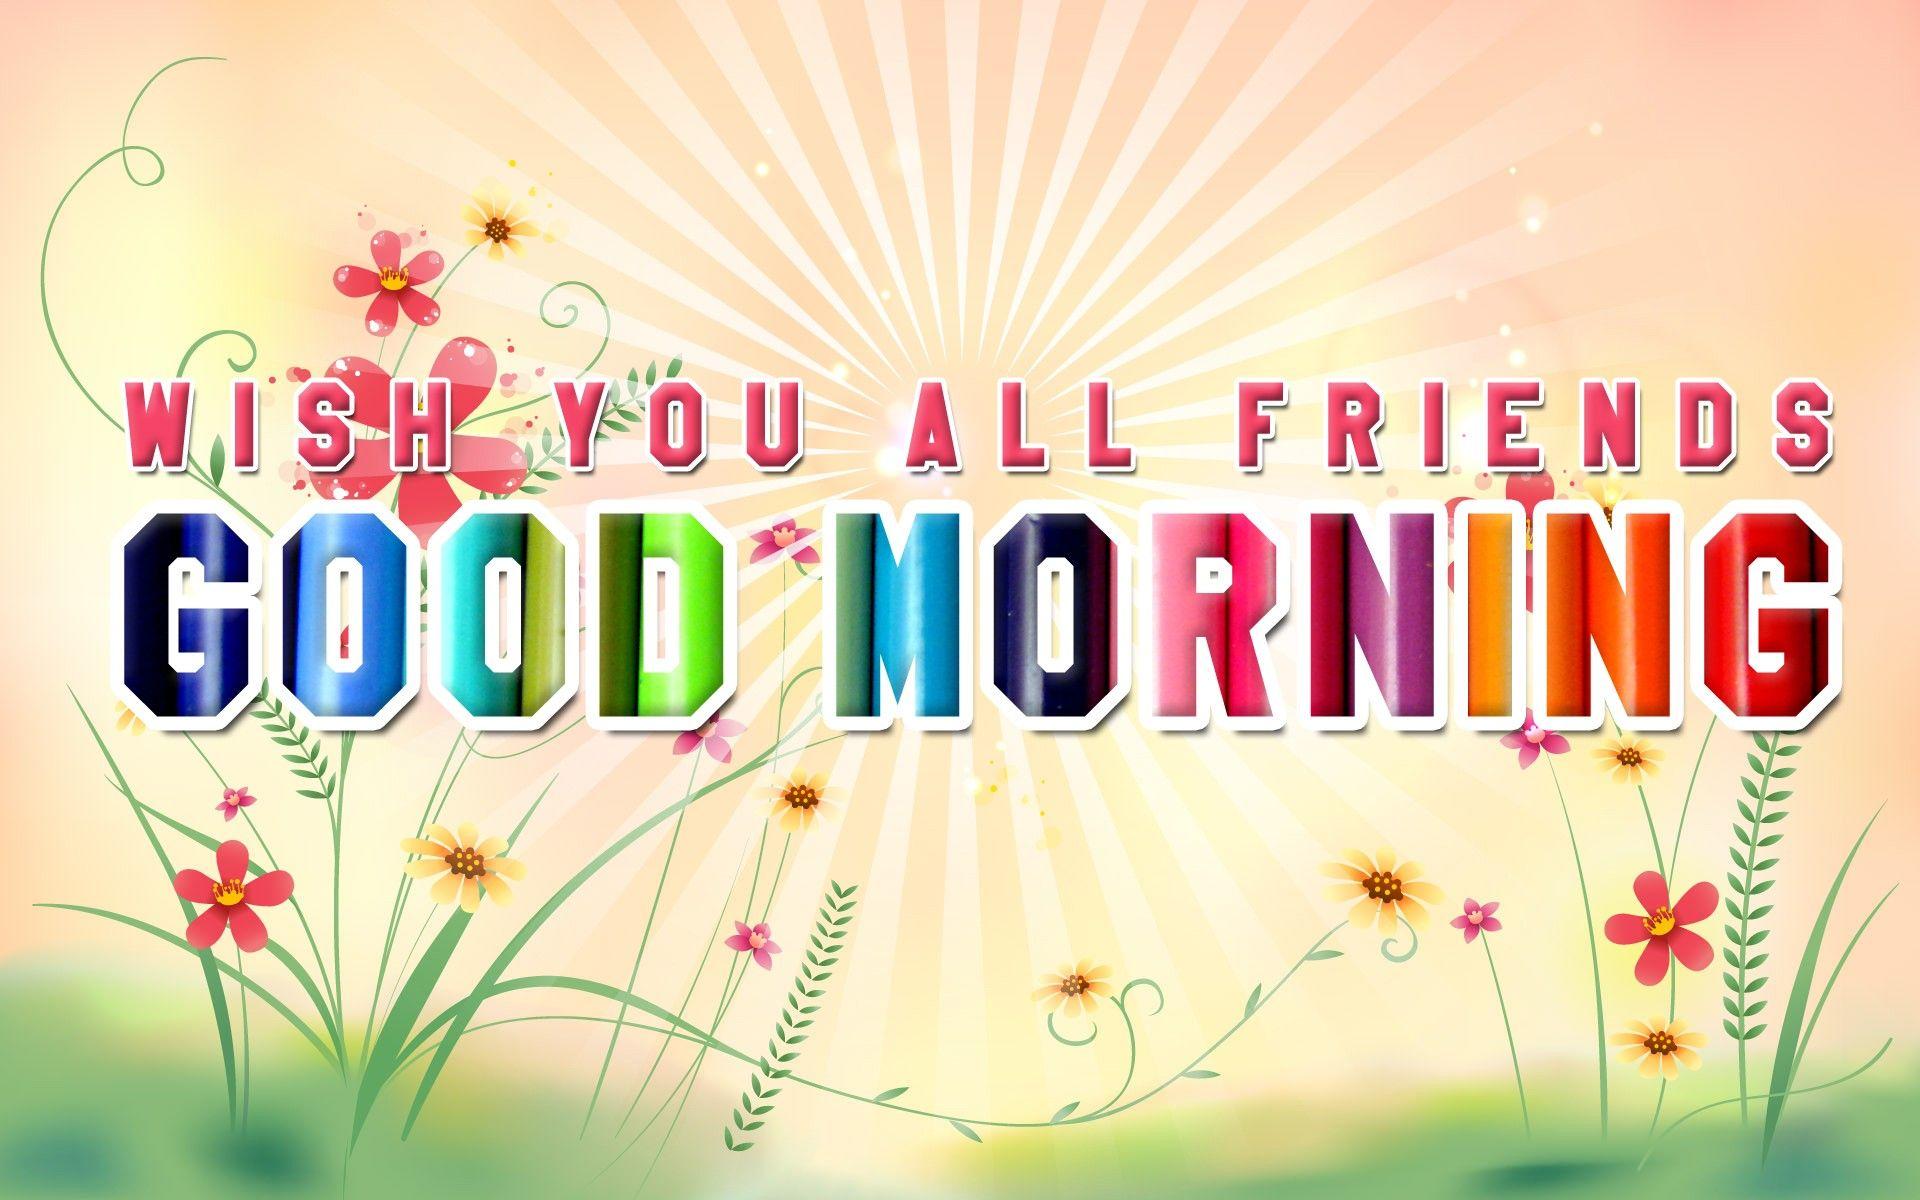 Hd wallpaper of good morning - Gangster Good Morning Wish You All Friends Good Morning Hd Wallpaper Categories Good Morning